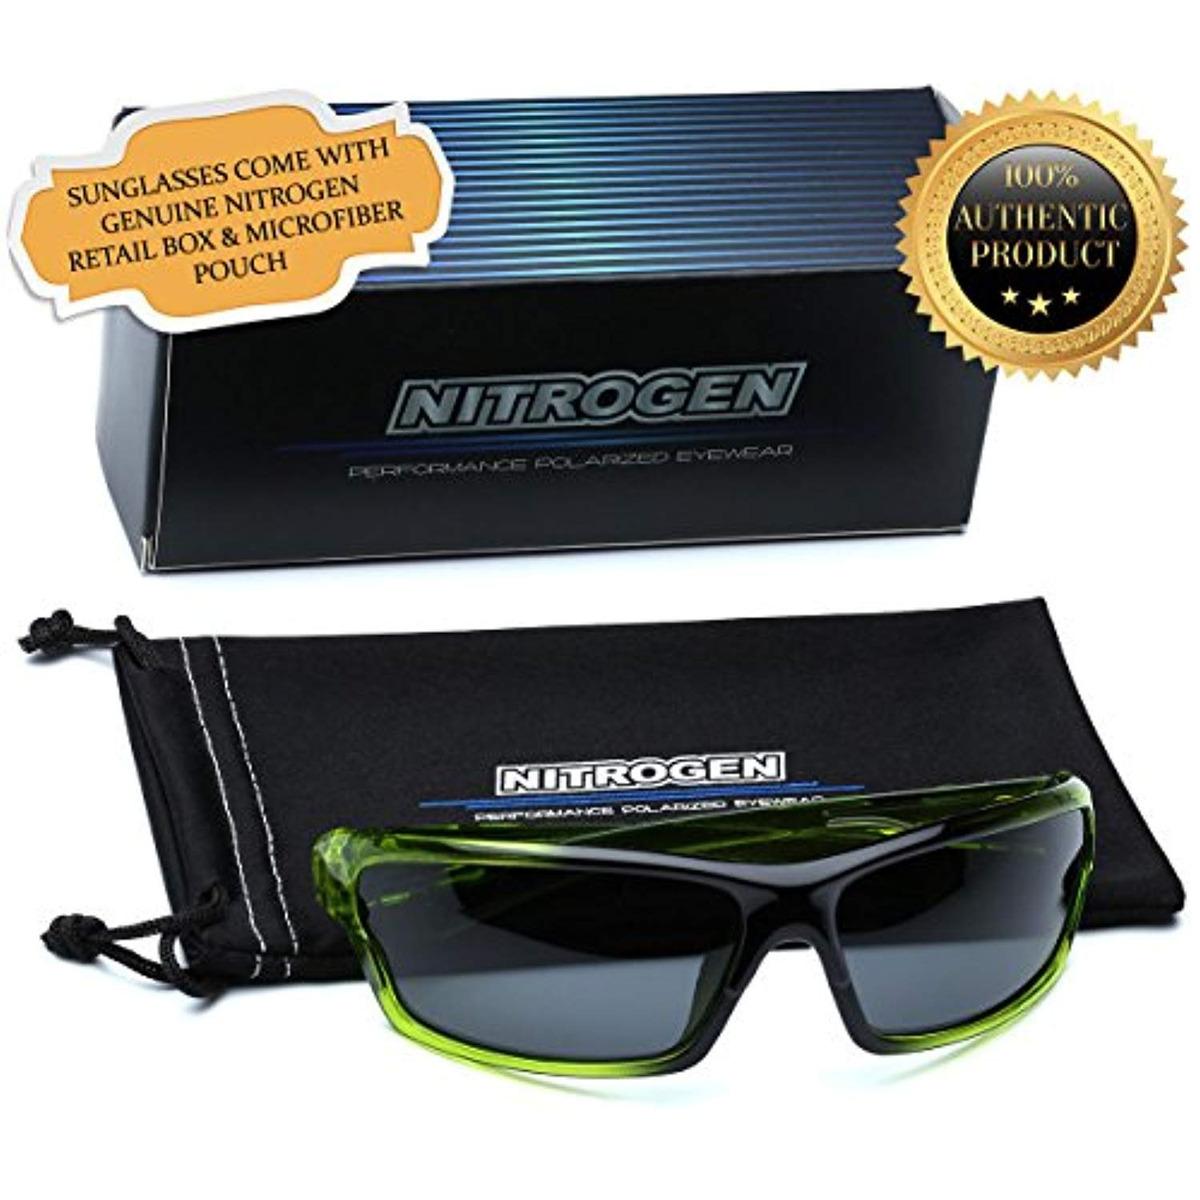 De Con 599 En Polarizadas Diseño Lima88 Gafas Sol Envolvente eWxBQCoErd